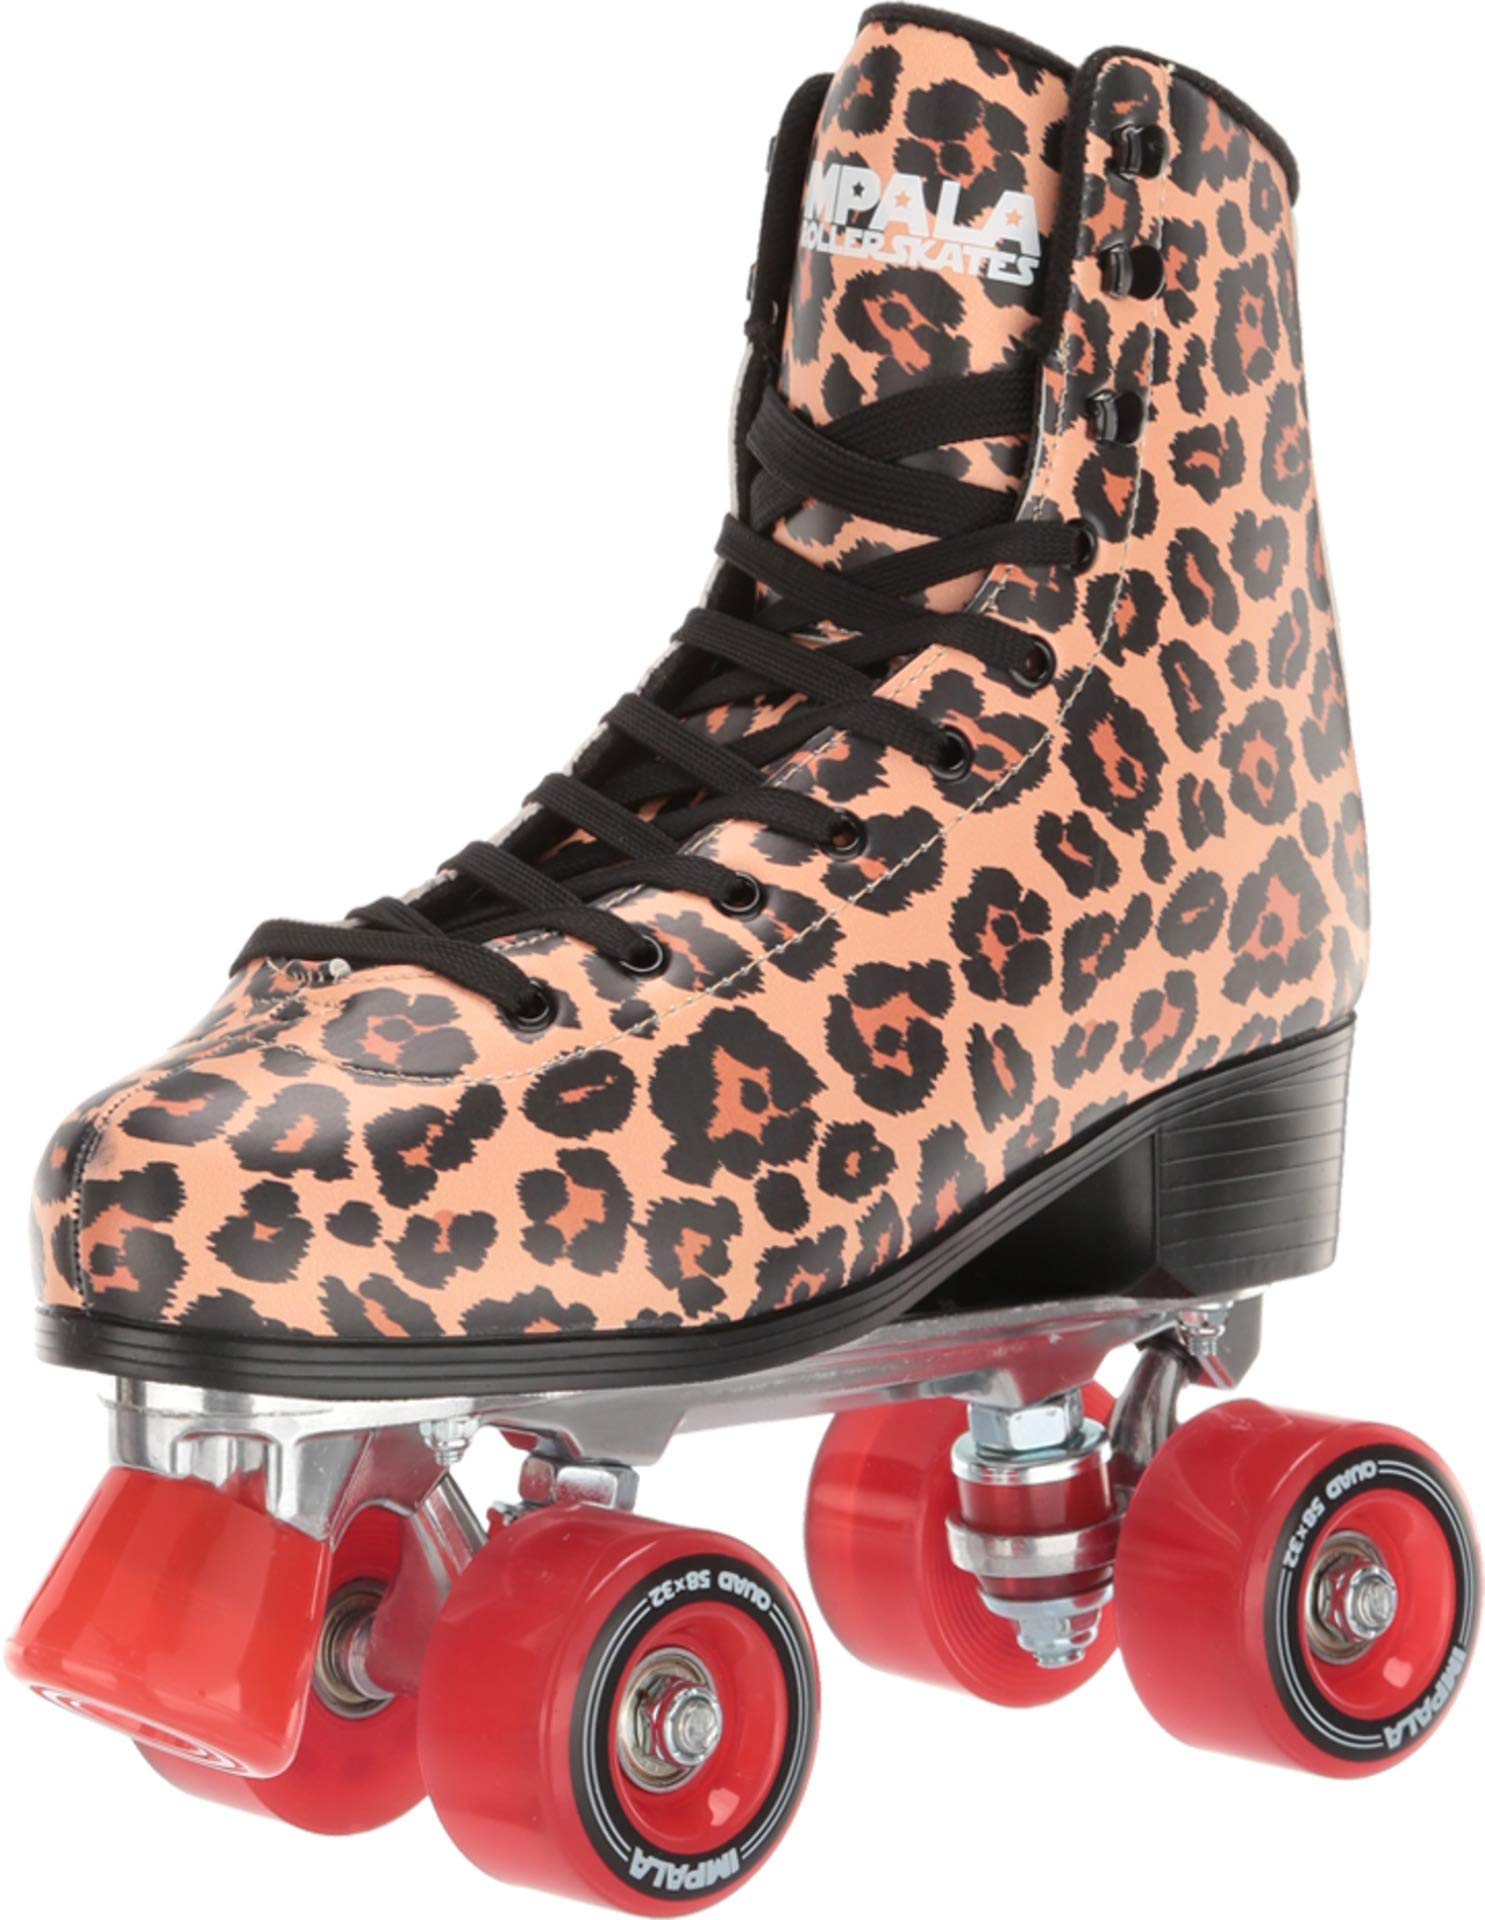 Impala Rollerskates Girl's Impala Quad Skate (Big Kid/Adult) Leopard 11 M by Impala Rollerskates